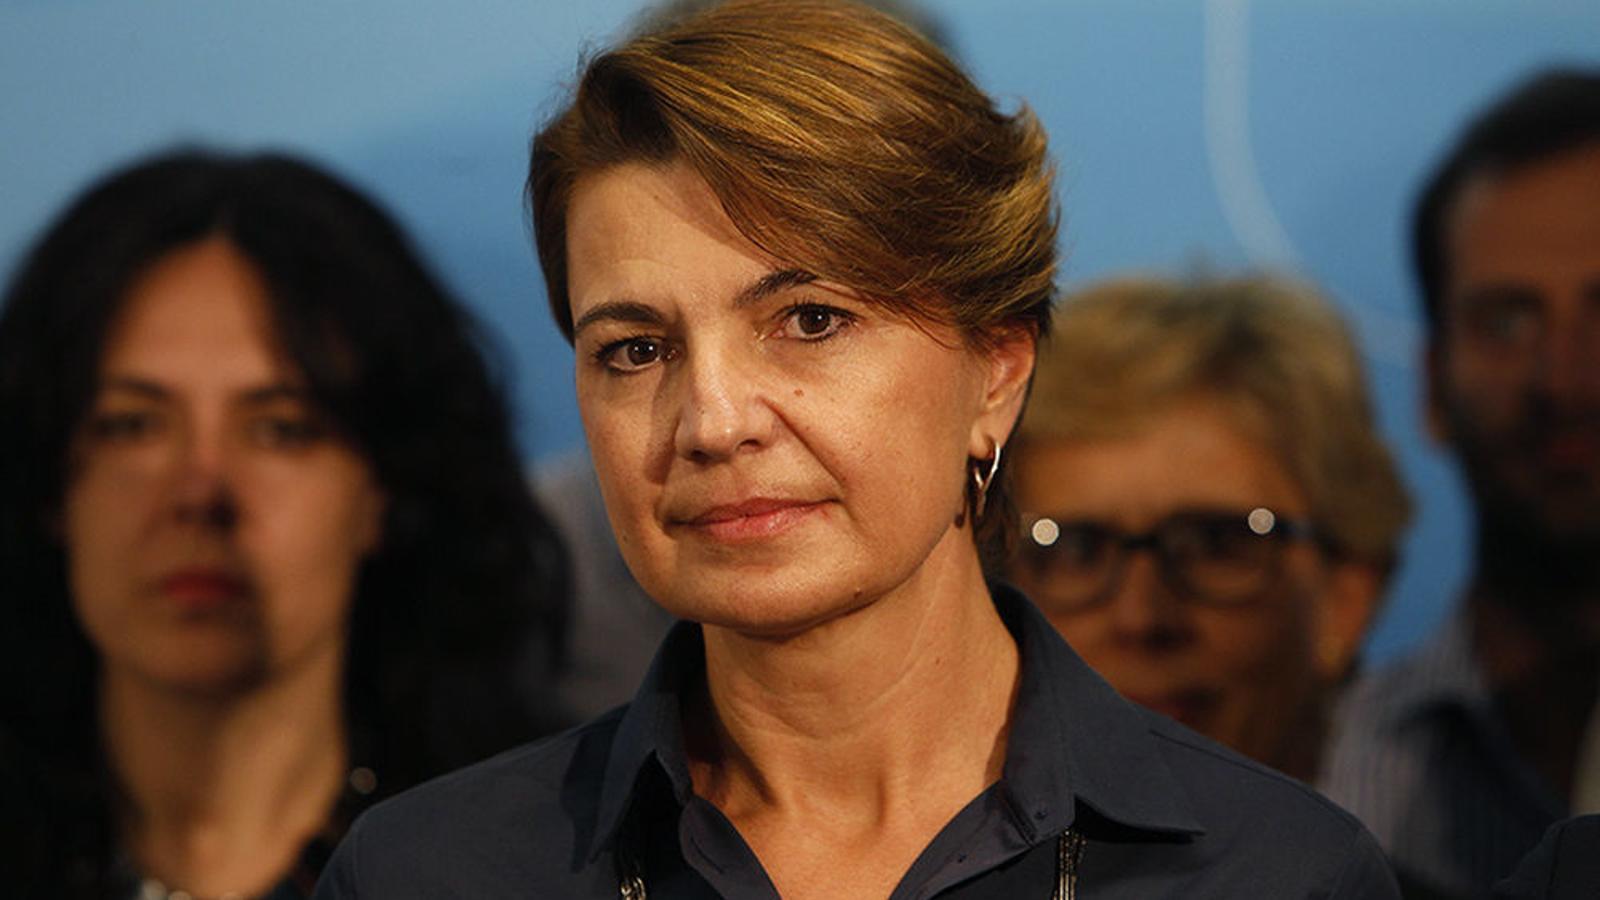 La presidenta del gestora del PP de Palma, Marga Duran, en imatge d'arxiu